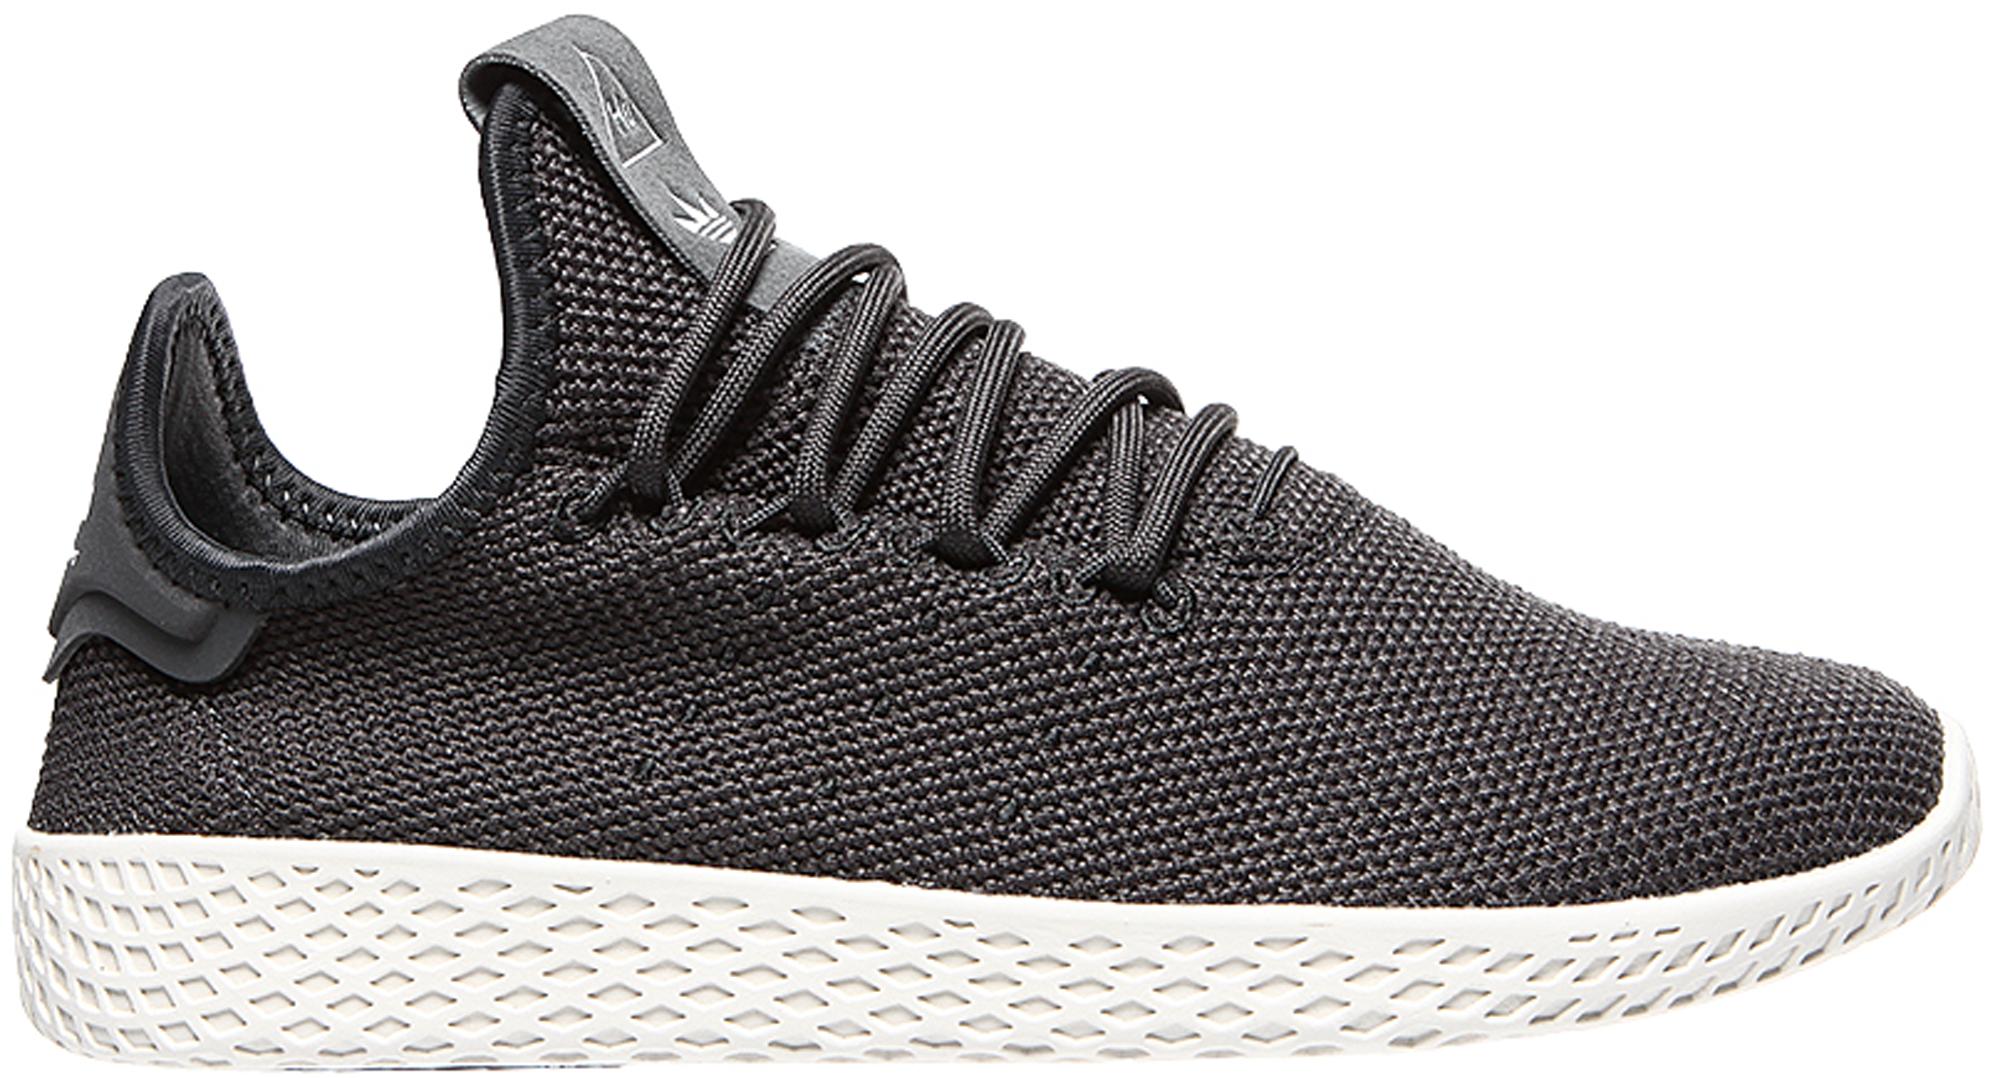 Adidas Originals Adidas Tennis Hu Pharrell Carbon (youth) In Carbon/carbon/chalk White